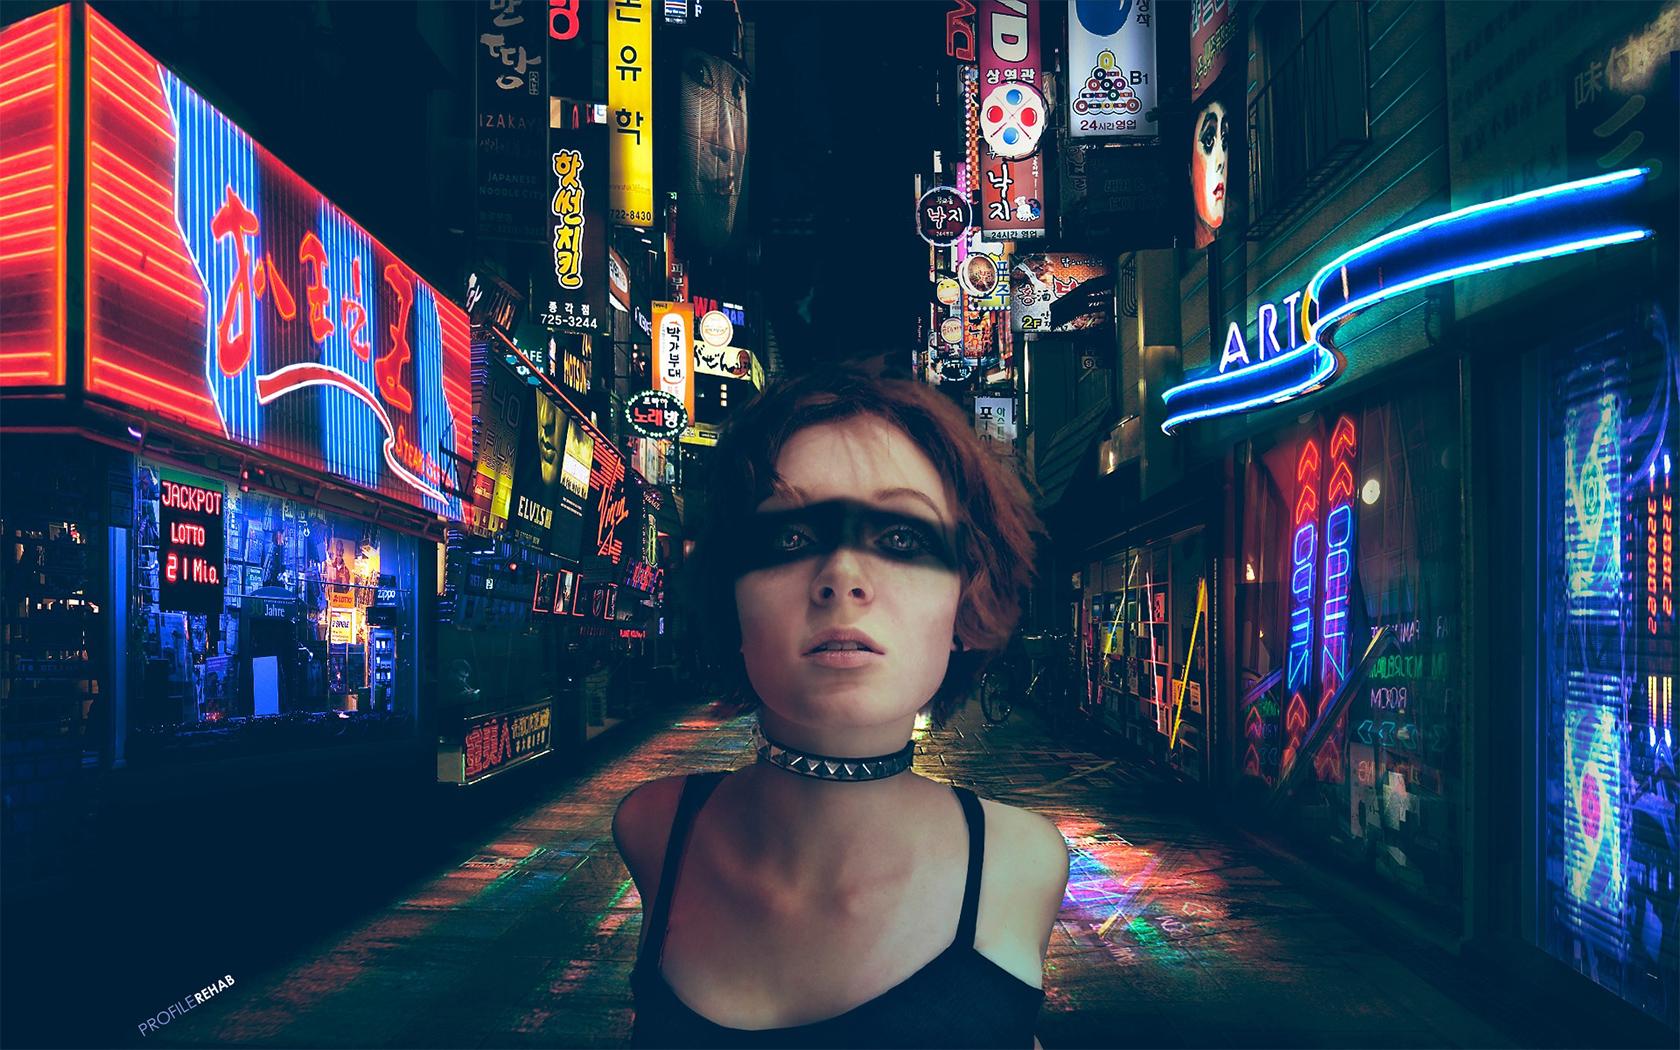 Girl With Glasses Wallpaper 1680x1050 Cool Cyberpunk Wallpaper Punk Girl